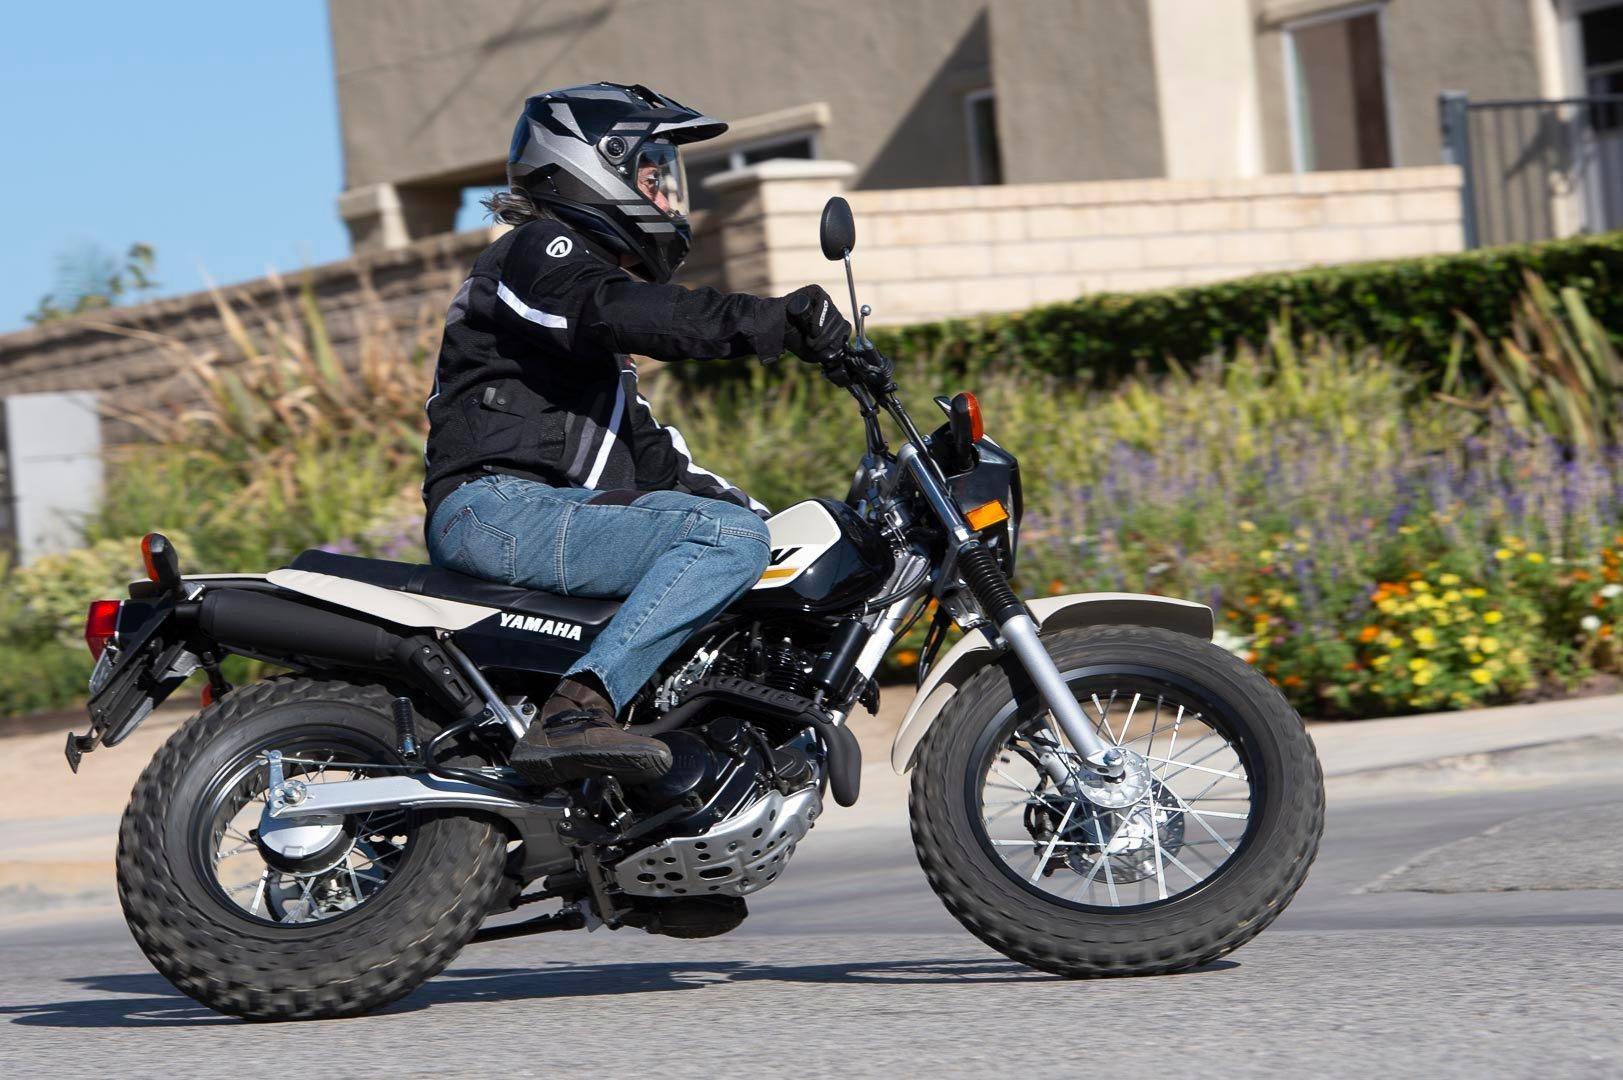 2020 Yamaha TW200 Review - Price